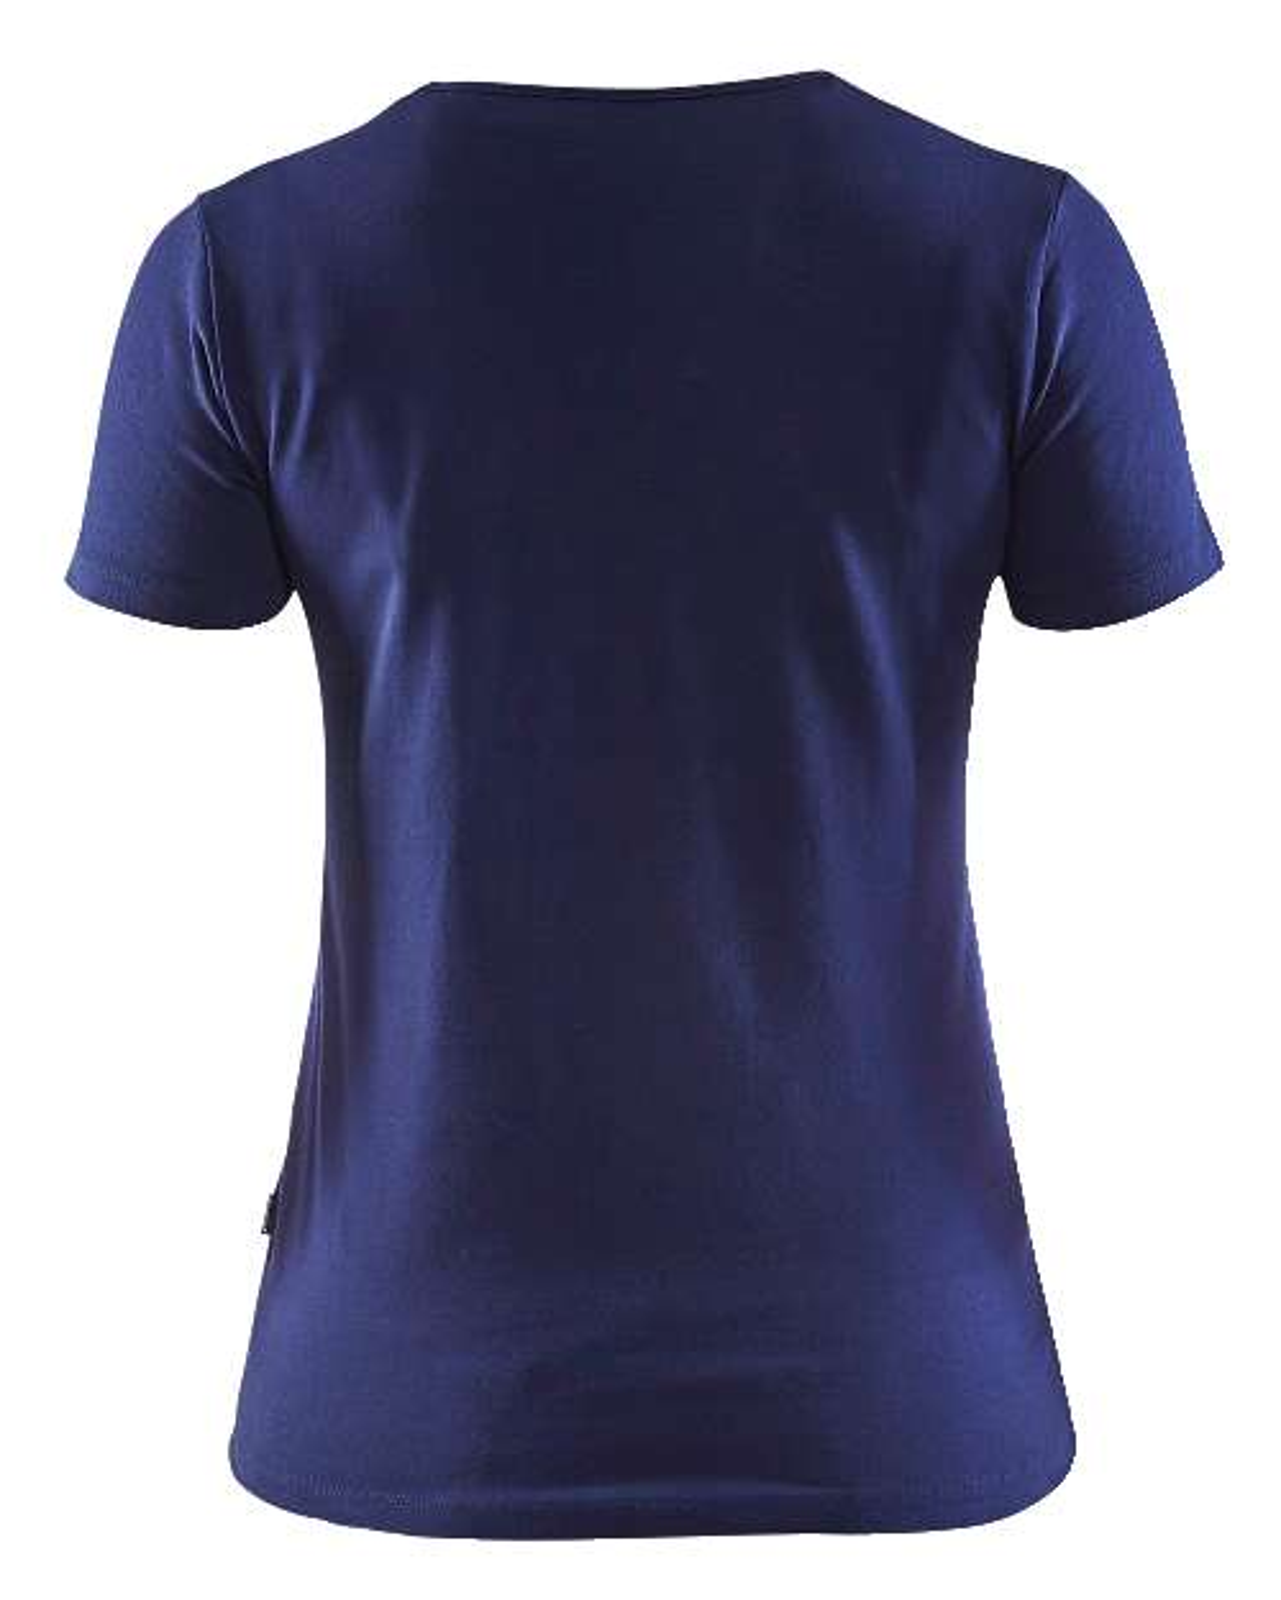 Blaklader Dames T-shirts 33041029 marineblauw(8800)